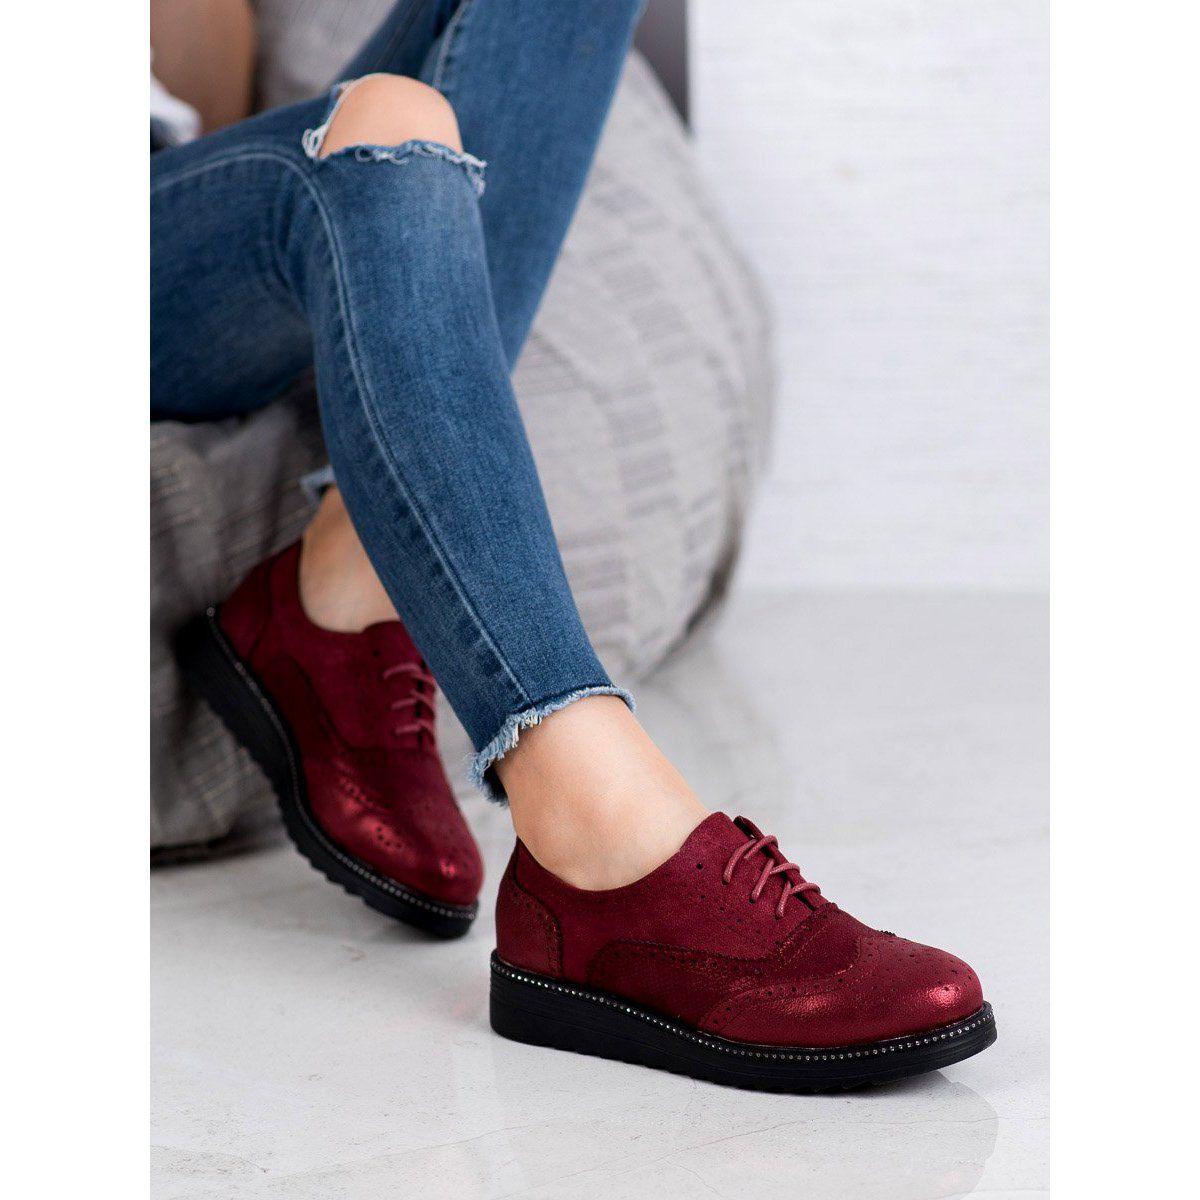 Bestelle Polbuty Na Platformie Czerwone Dress Shoes Men Cole Haan Zerogrand Oxford Cole Haan Zerogrand